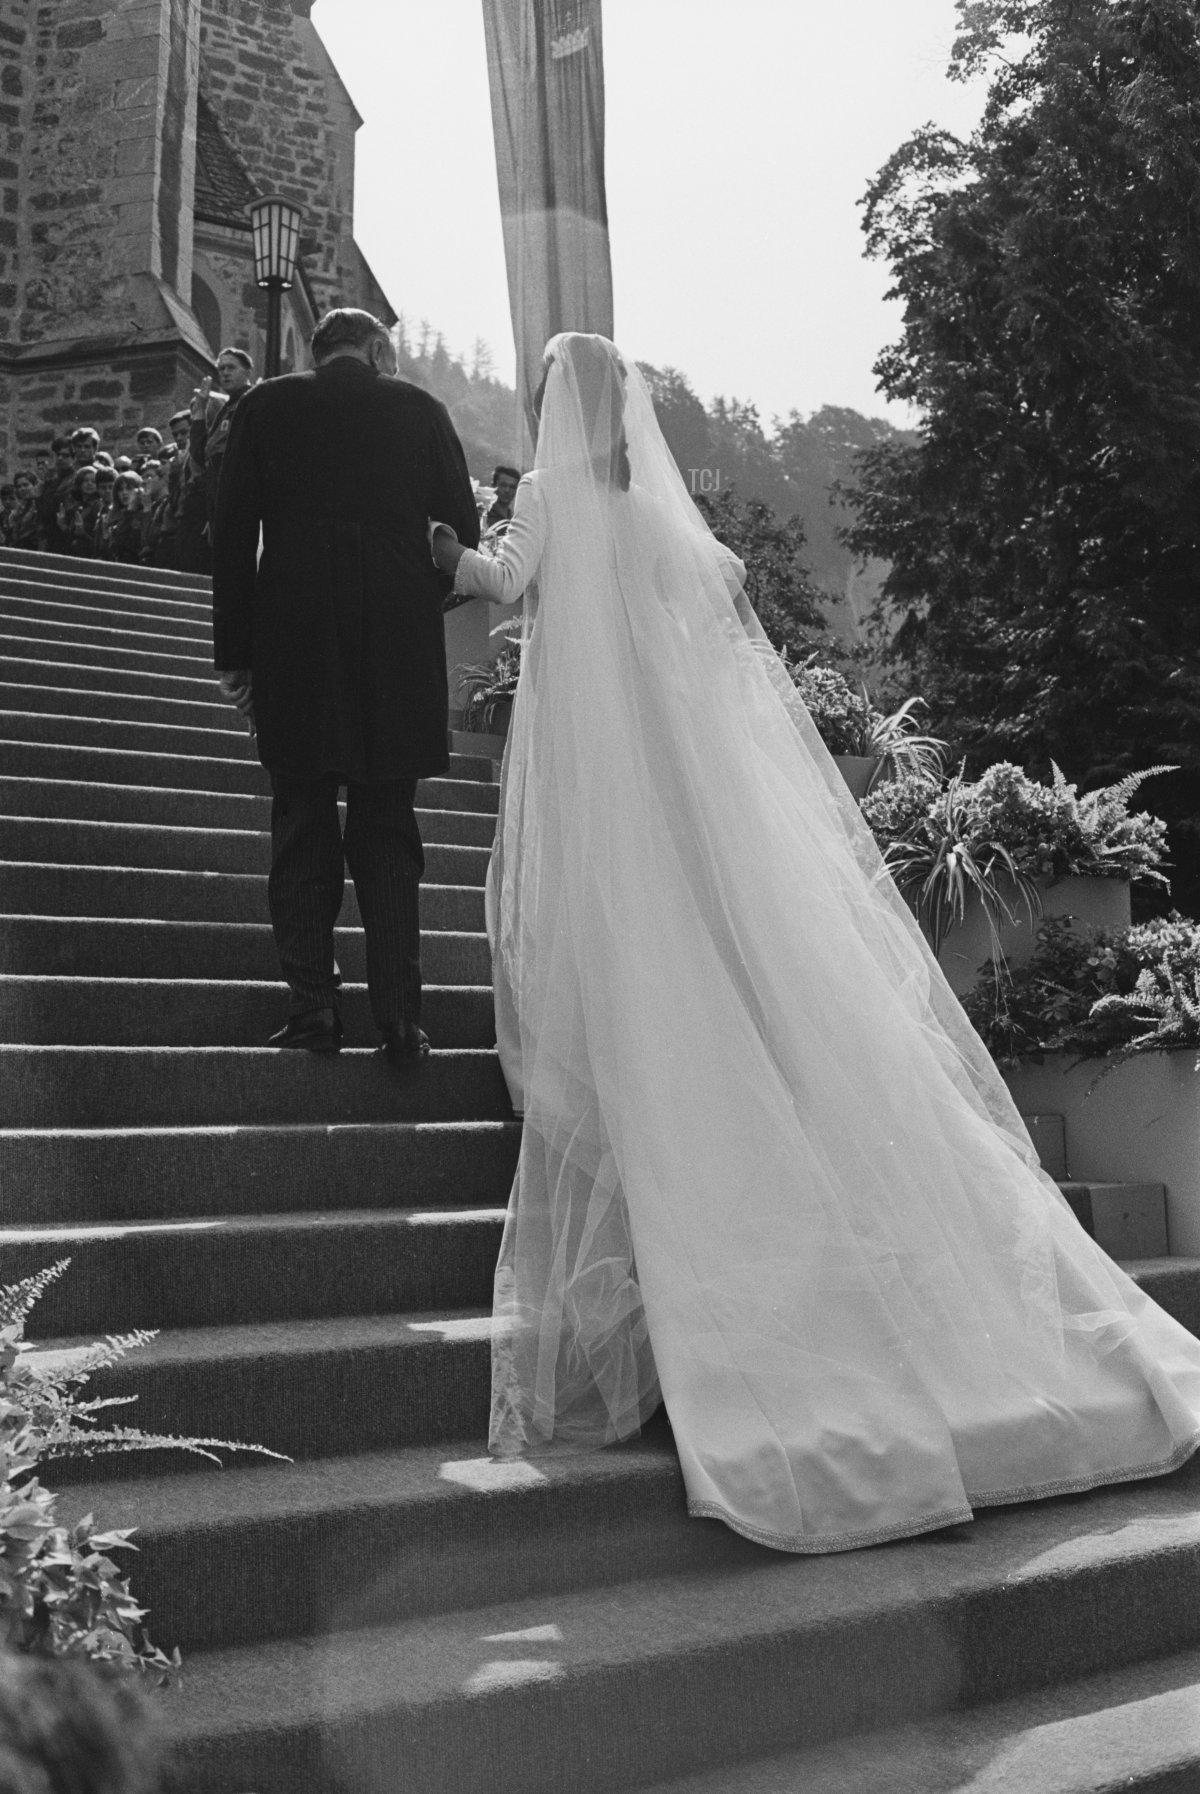 Countess Marie Aglaë Kinsky of Wchinitz and Tettau marries Hans-Adam II, Prince of Liechtenstein at Vaduz Cathedral, Liechtenstein, 30th July 1967